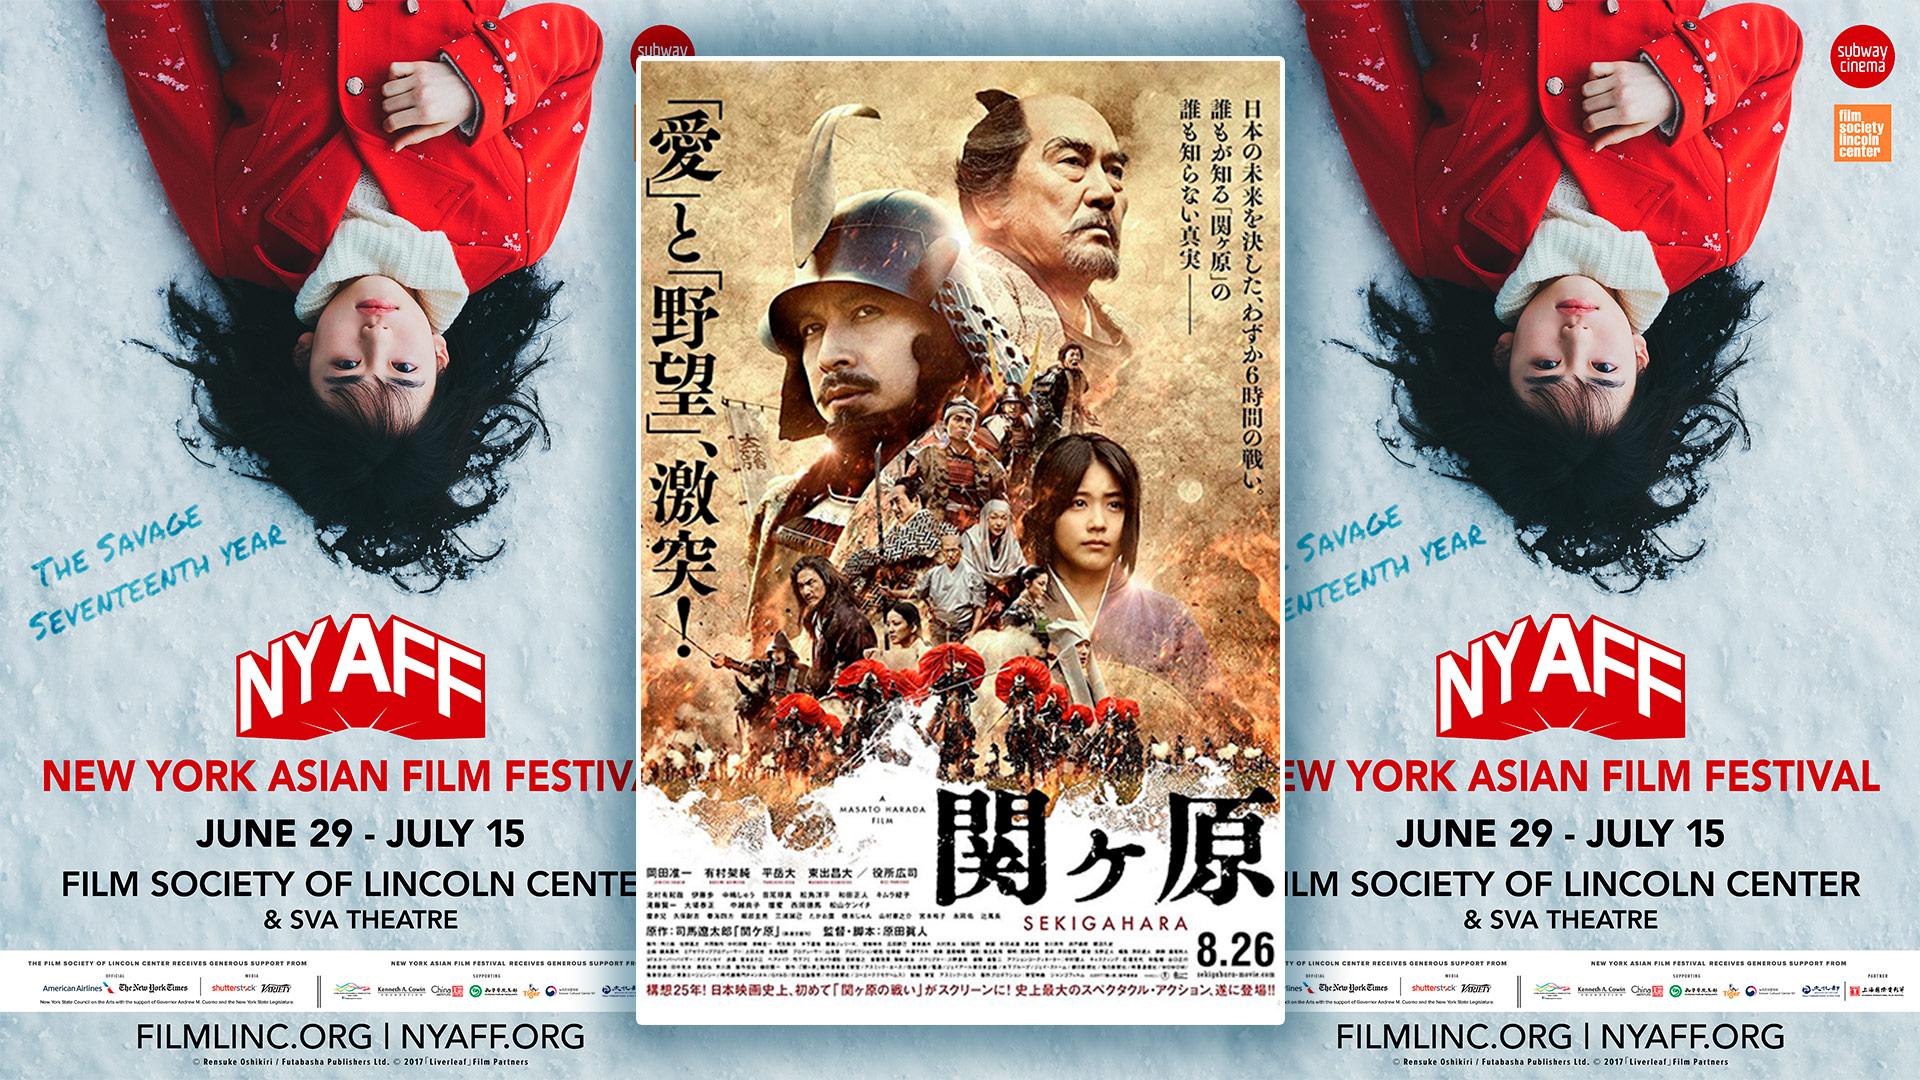 [NYAFF 2018] Critique du film Sekigahara